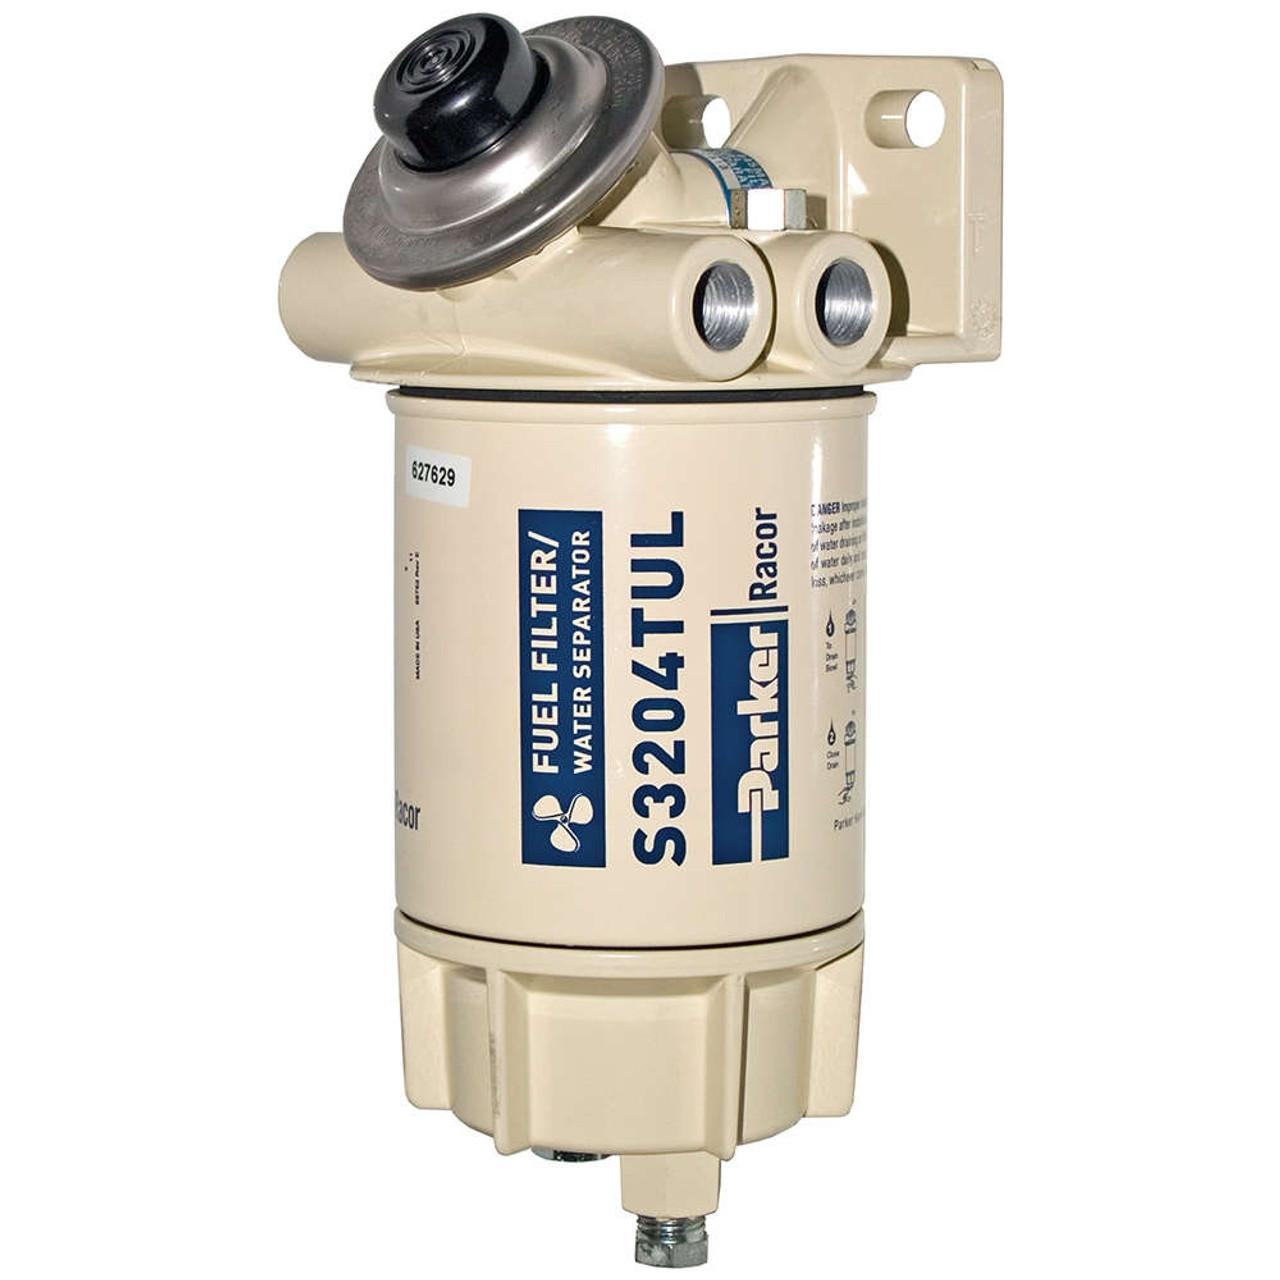 hight resolution of 45 gph spin on diesel fuel filter